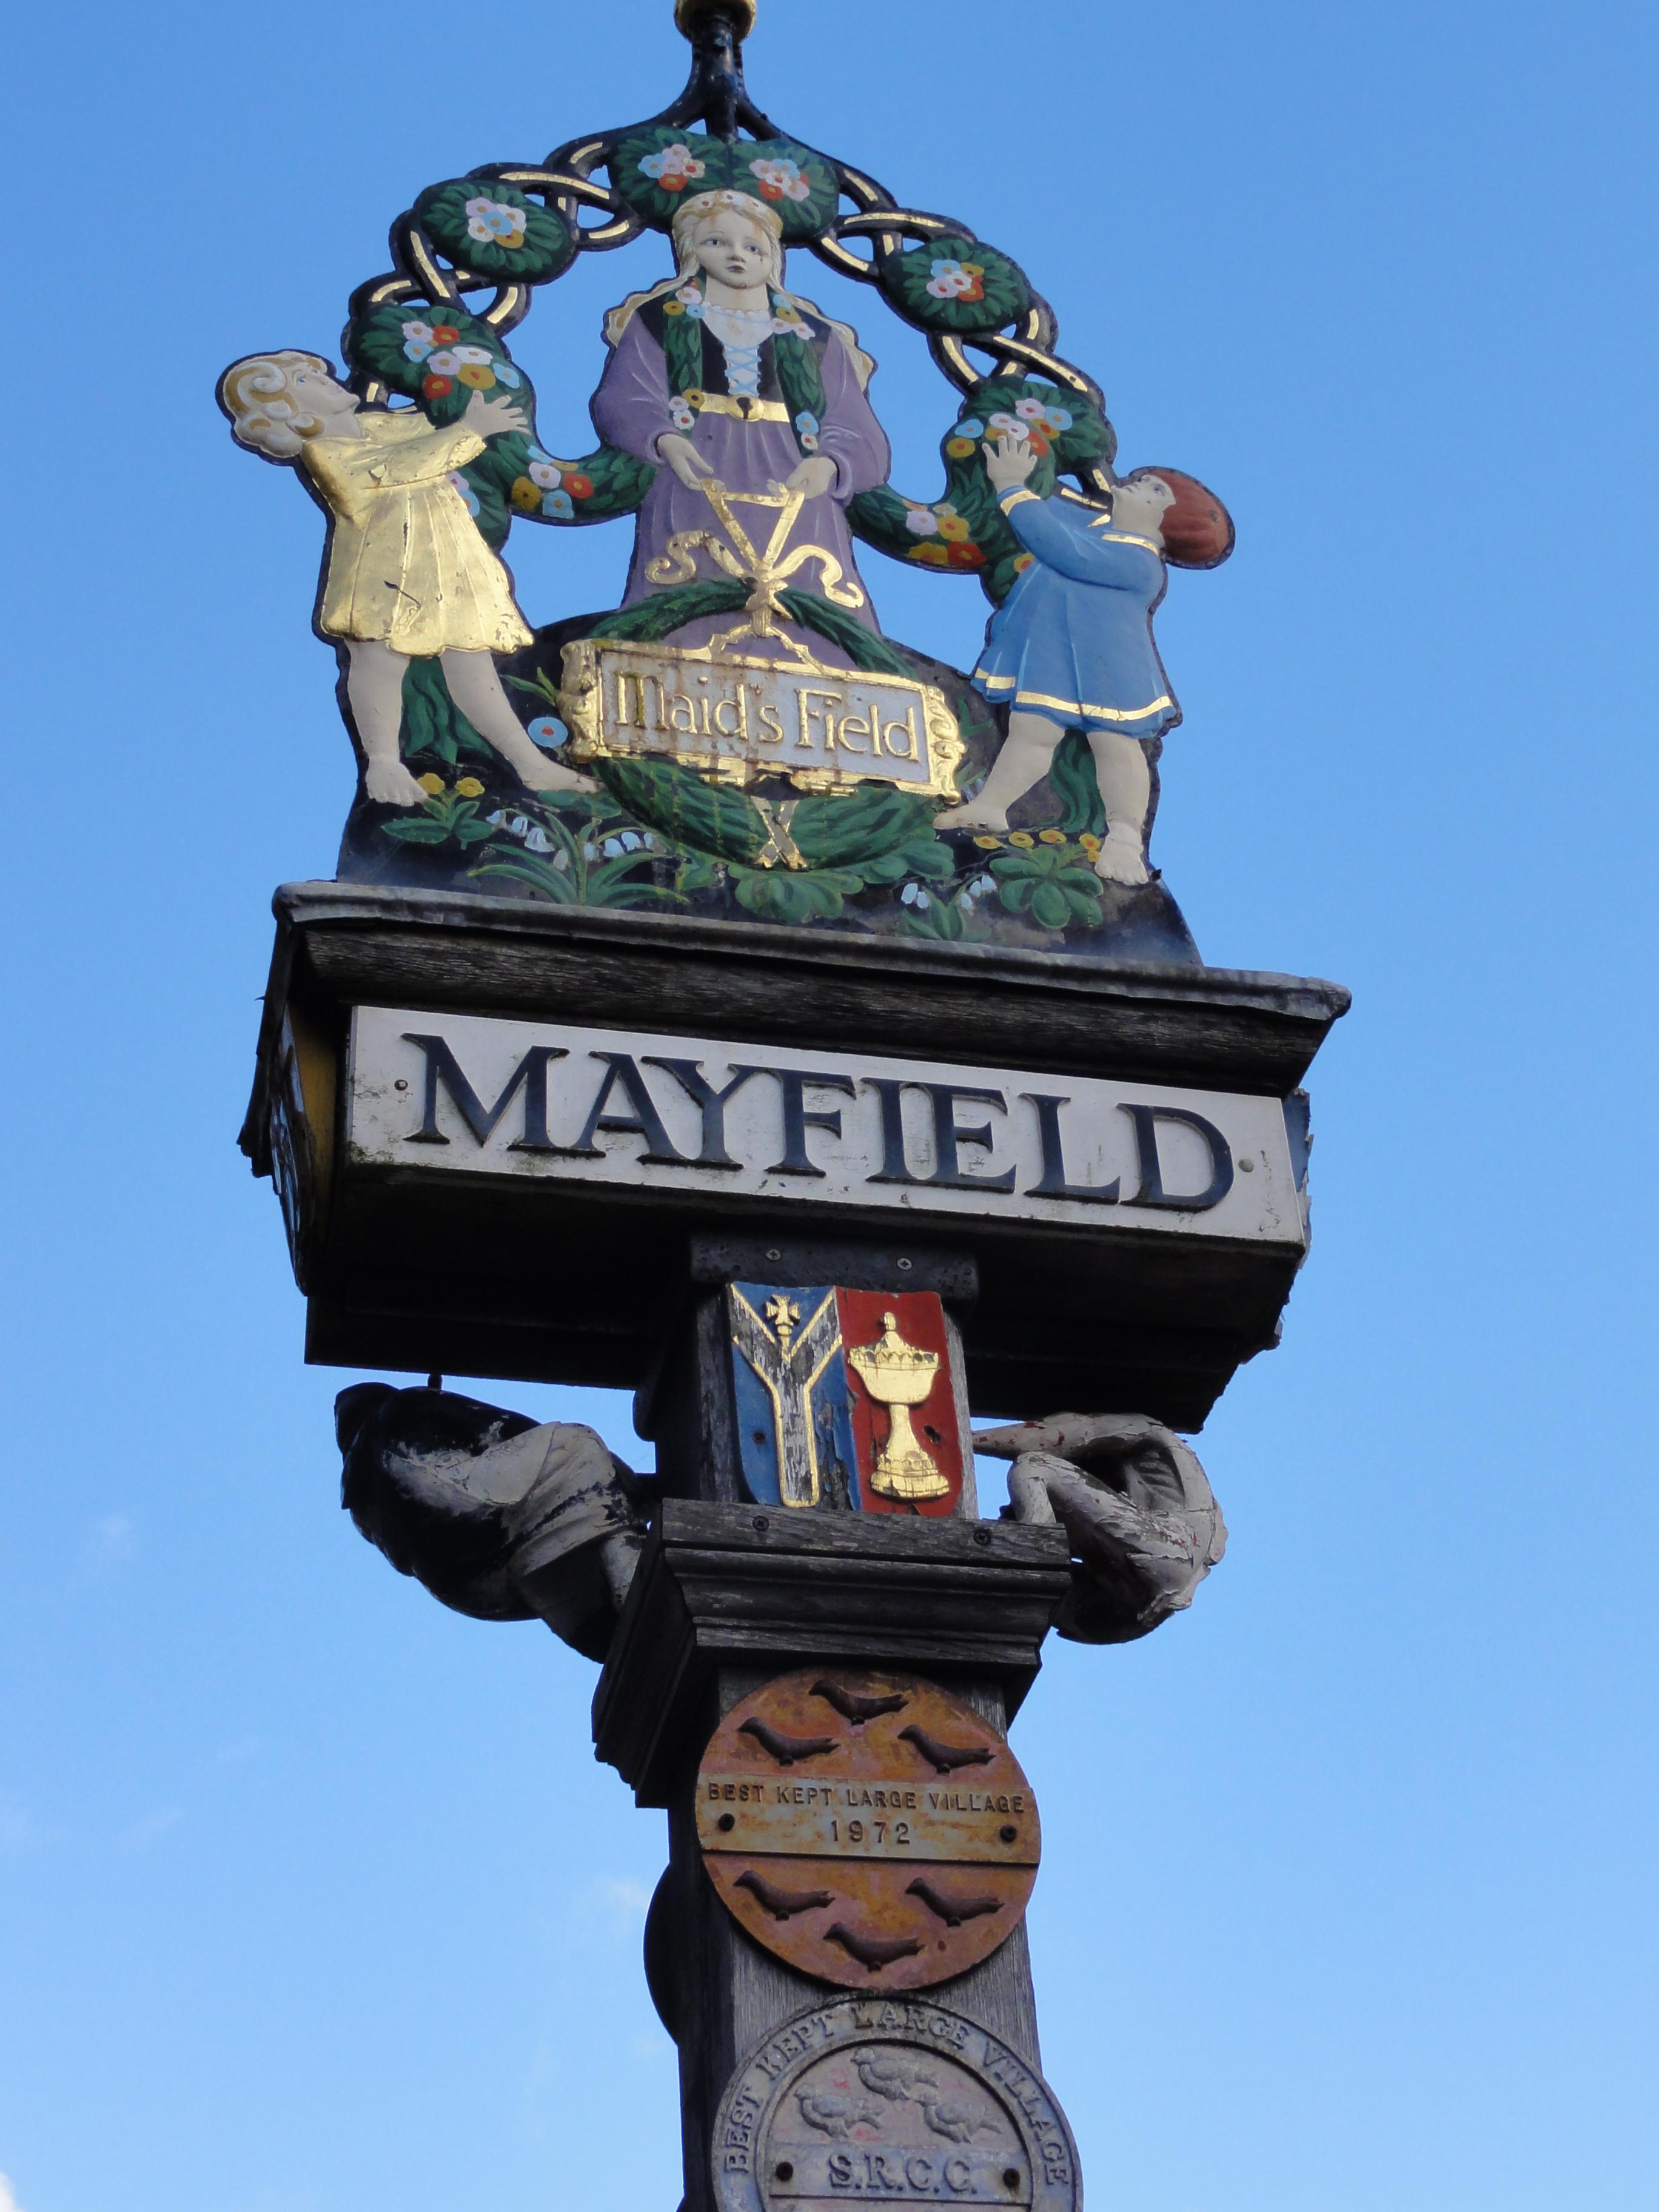 Mayfield_village_sign.jpgmayfield village